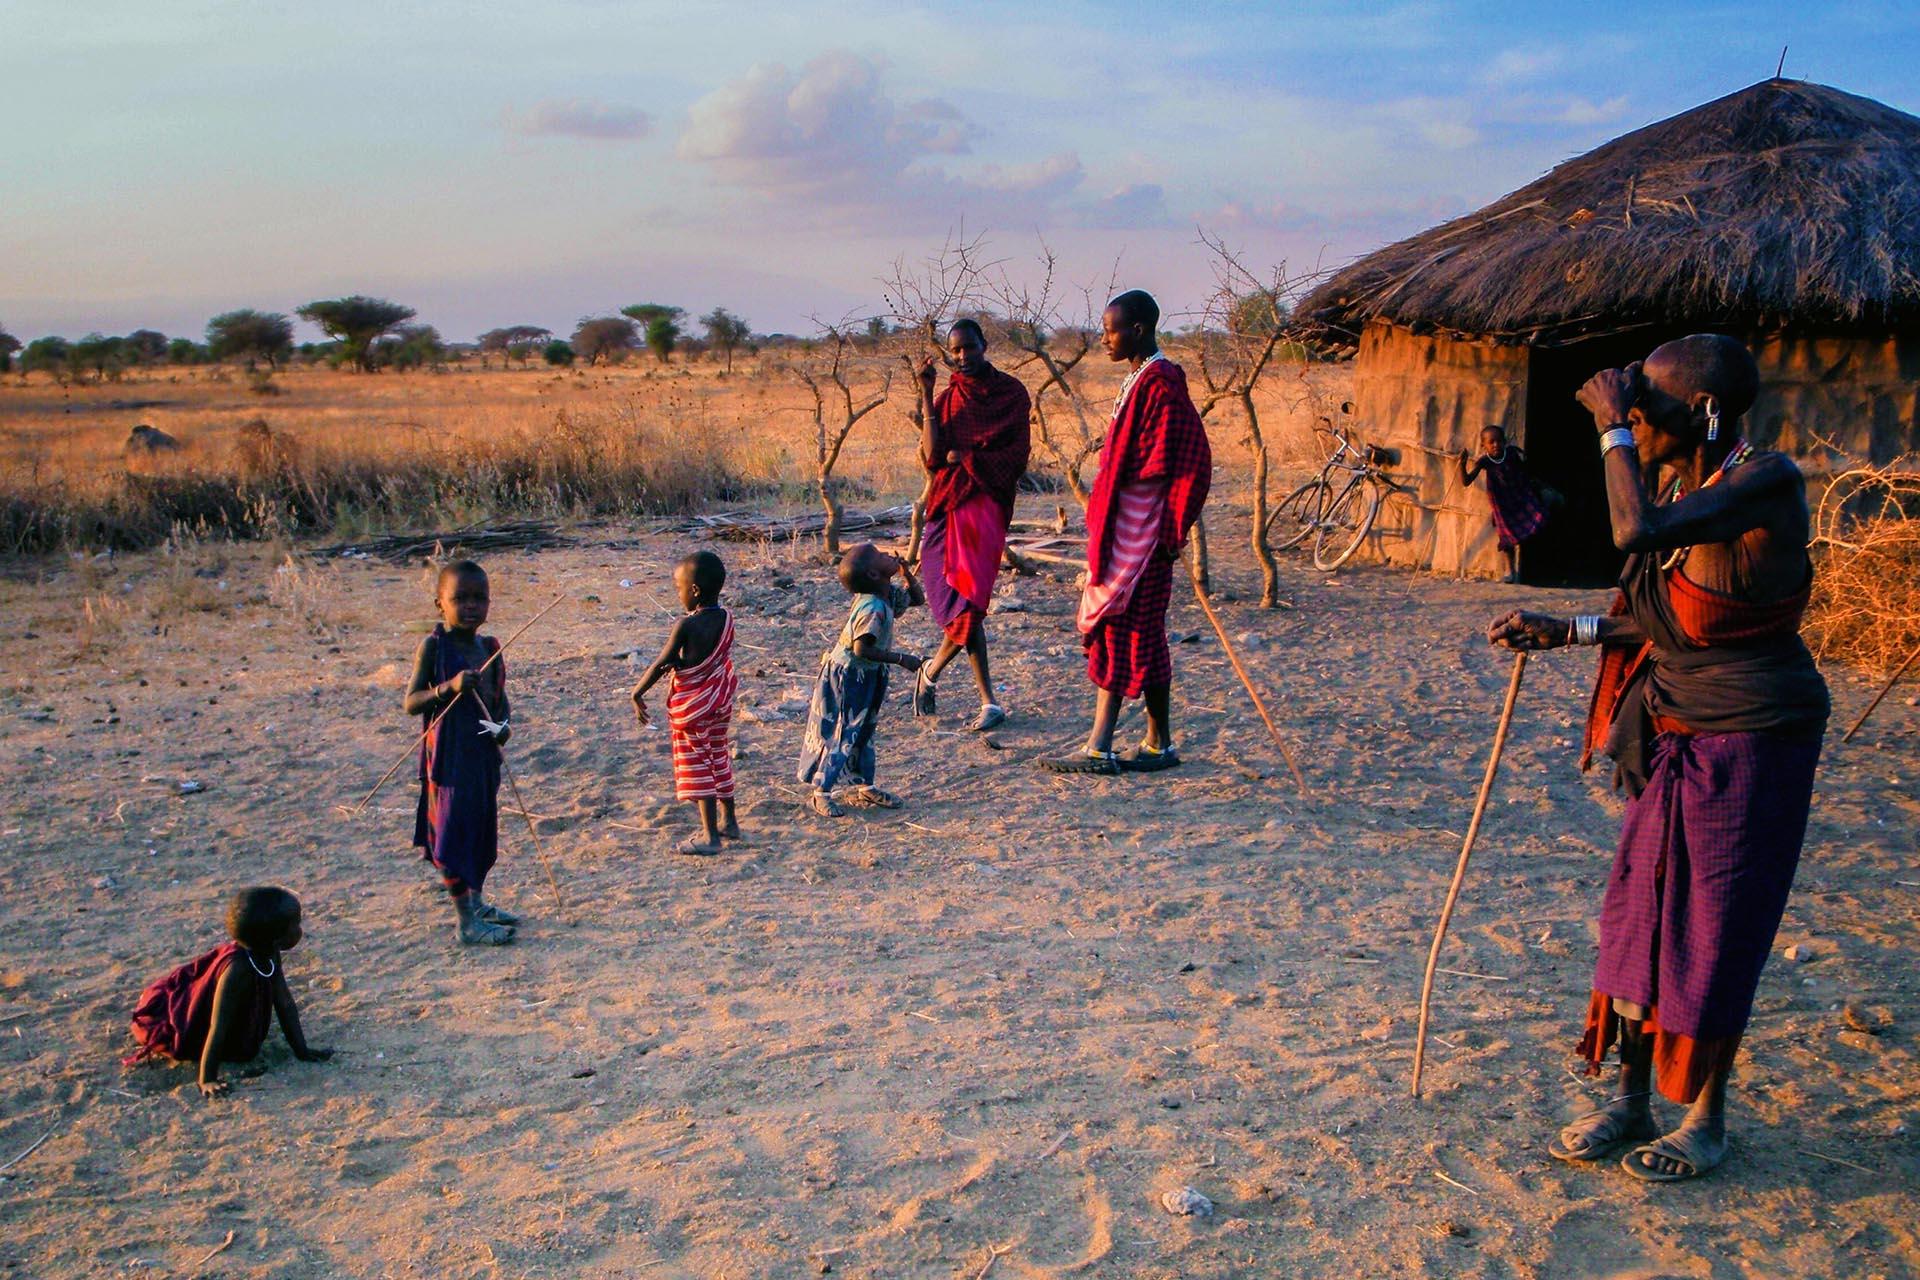 esilalei-village-community-projects-maasai-wanderings-safari-itineraries-signature-photo-safaris-africa